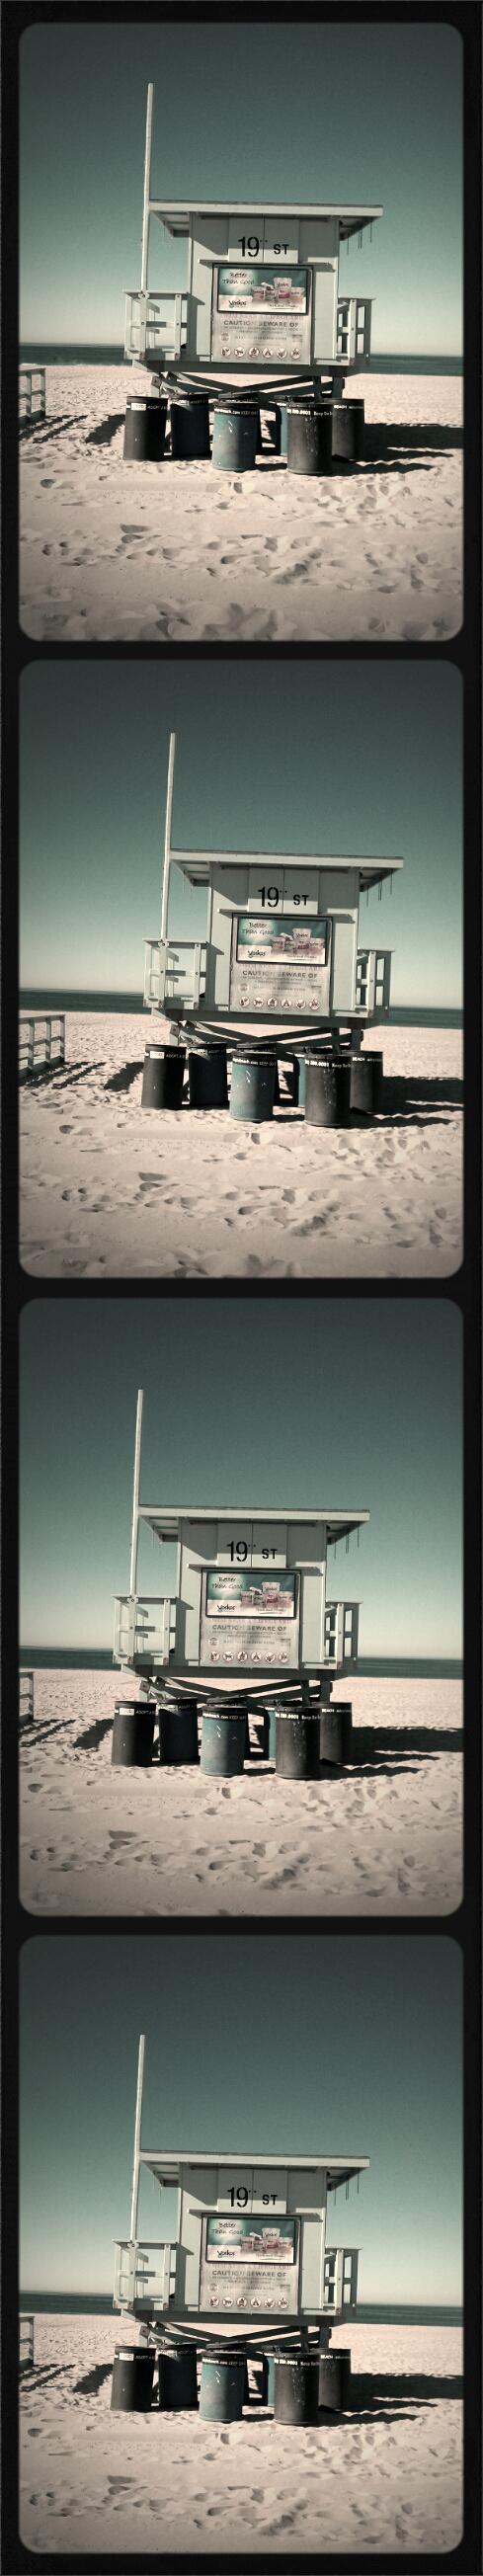 take your trash to the beach.jpg